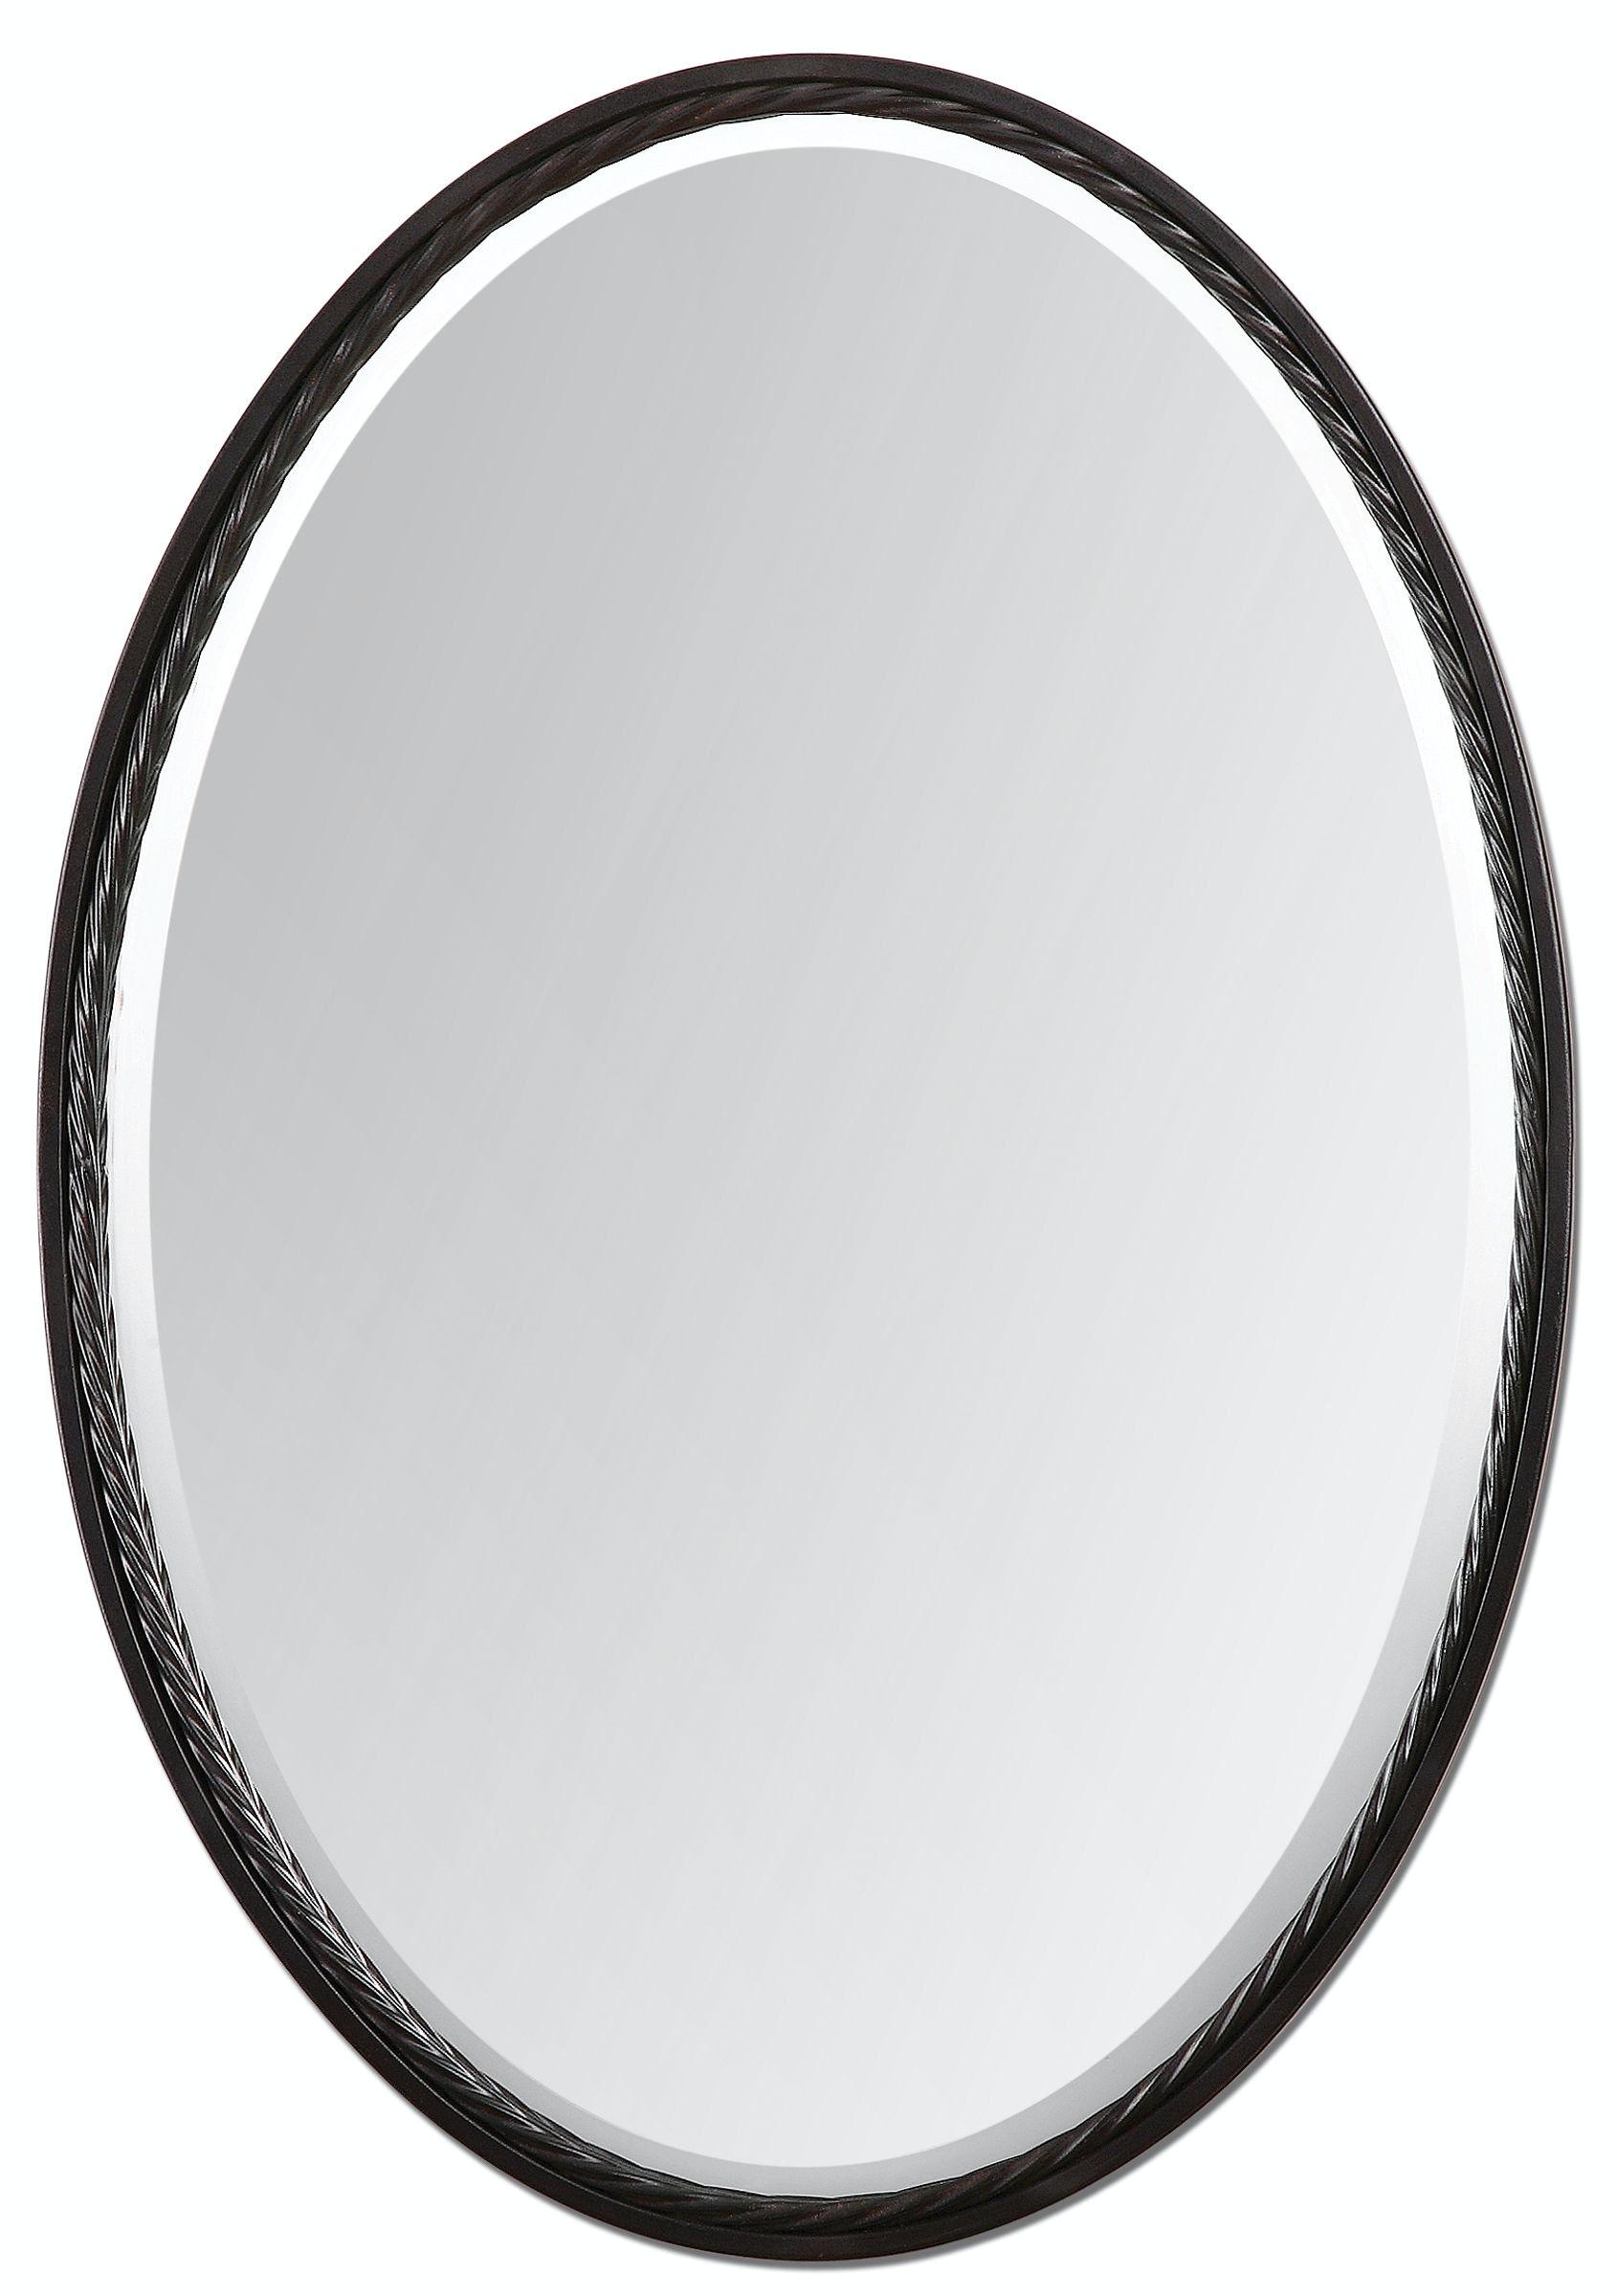 uttermost casalina oil rubbed bronze oval mirror 01116 uttermost bedroom casalina oil rubbed bronze oval mirror 01116   j      rh   jbradwells